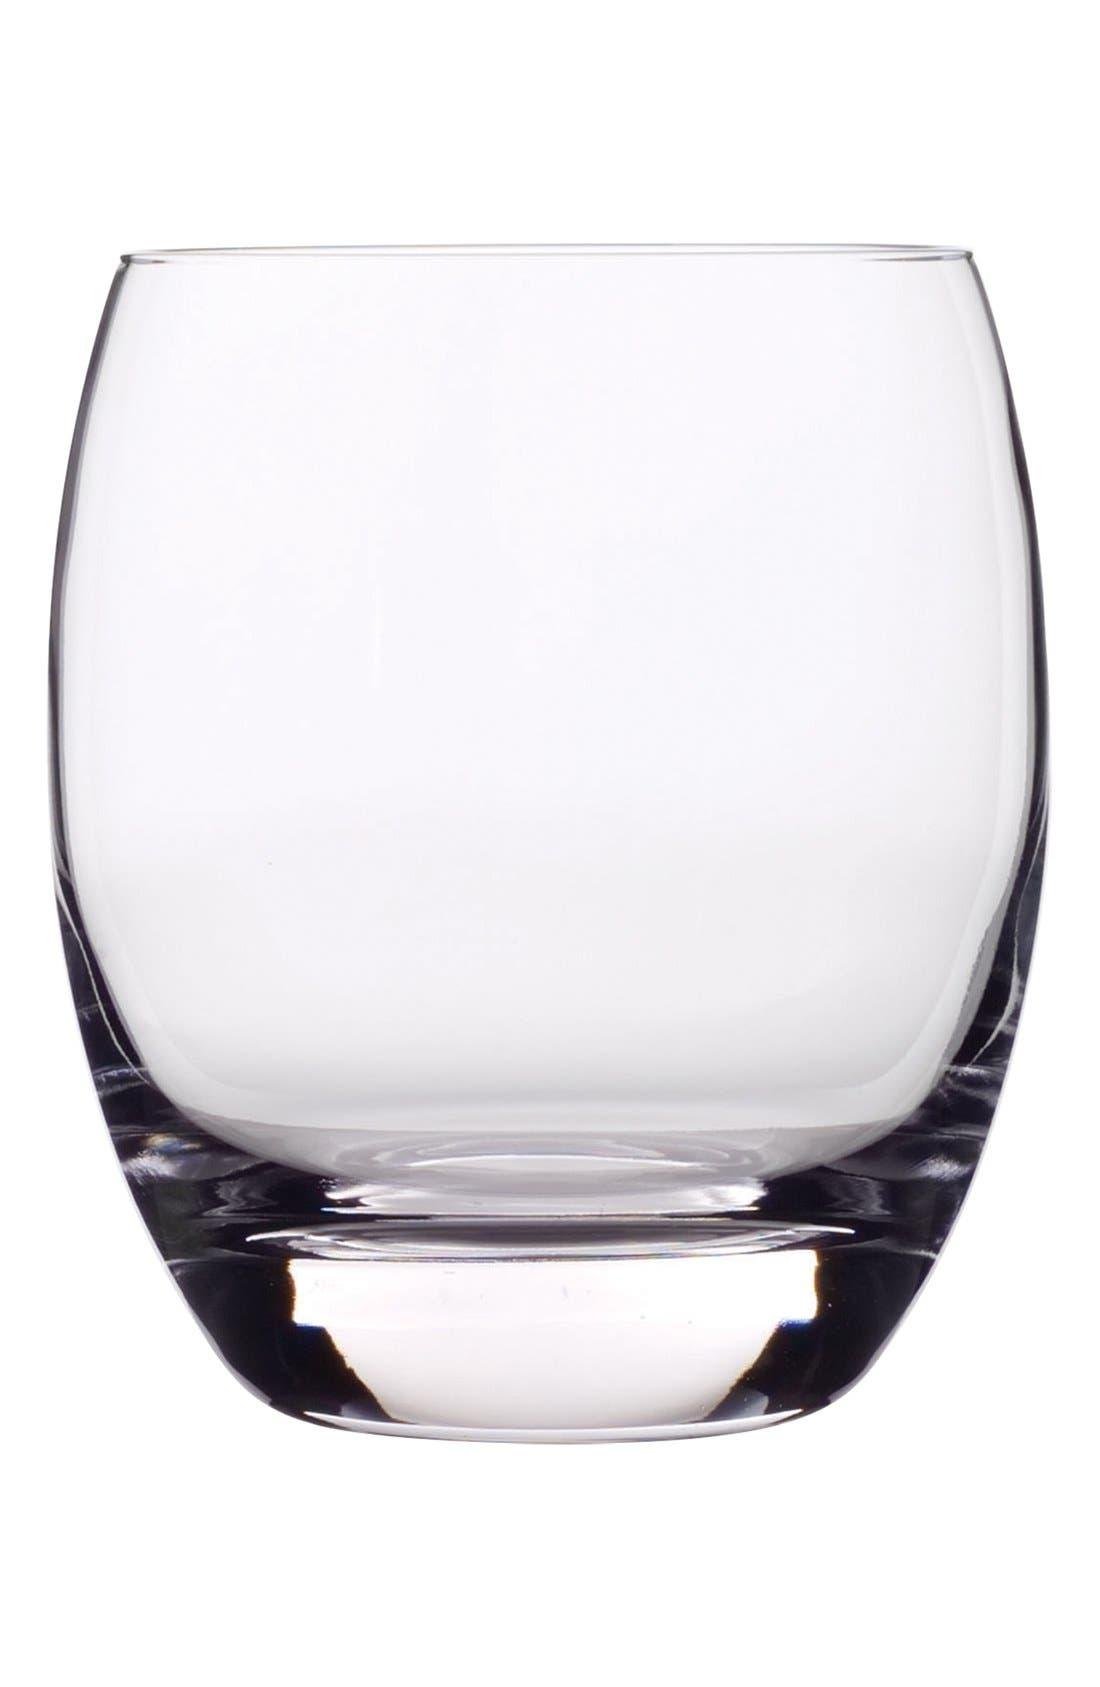 'Crescendo' Double Old Fashioned Glasses,                             Main thumbnail 1, color,                             000